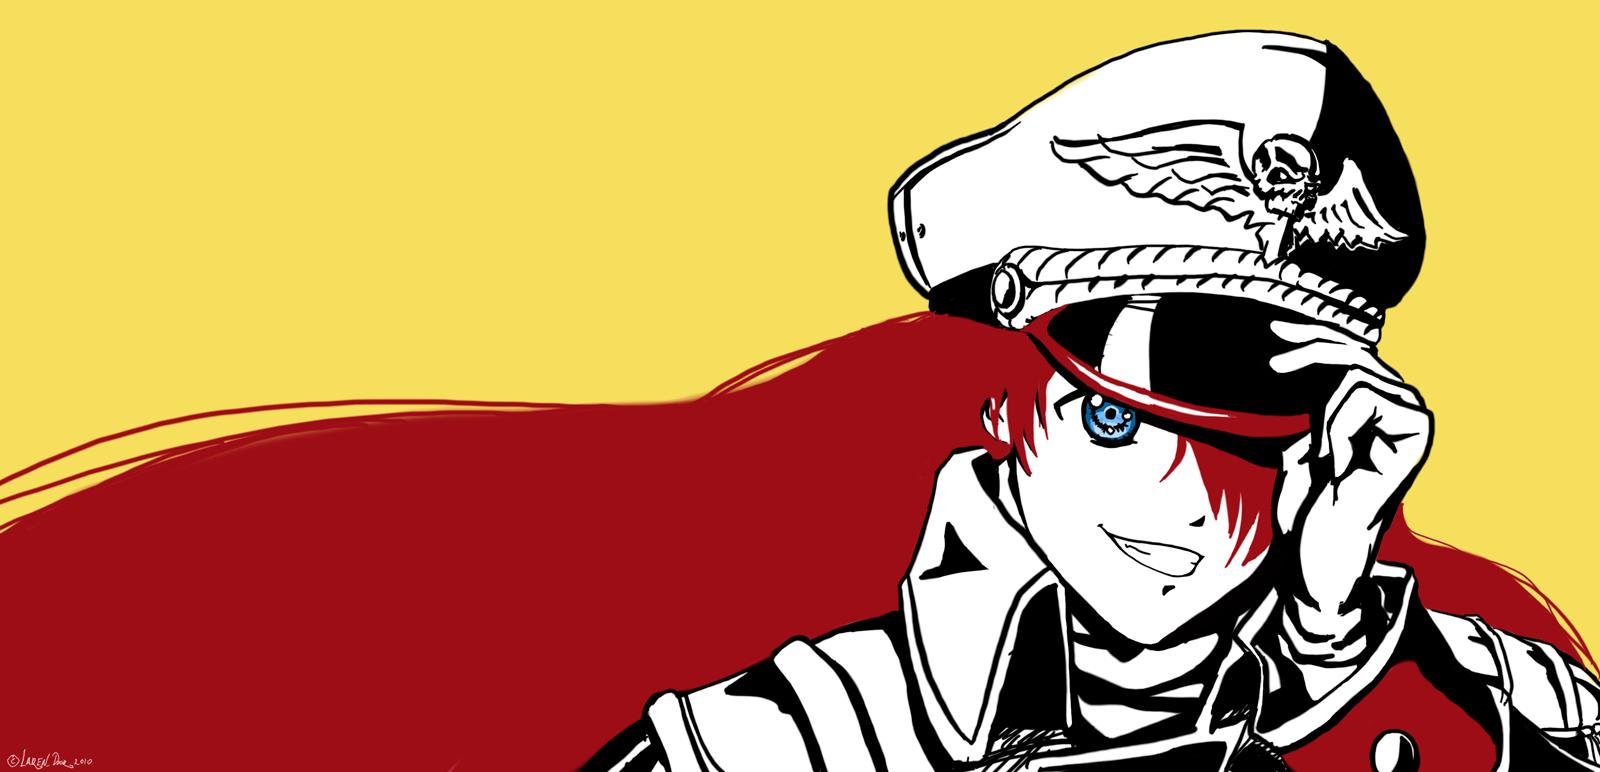 Kommissar Red